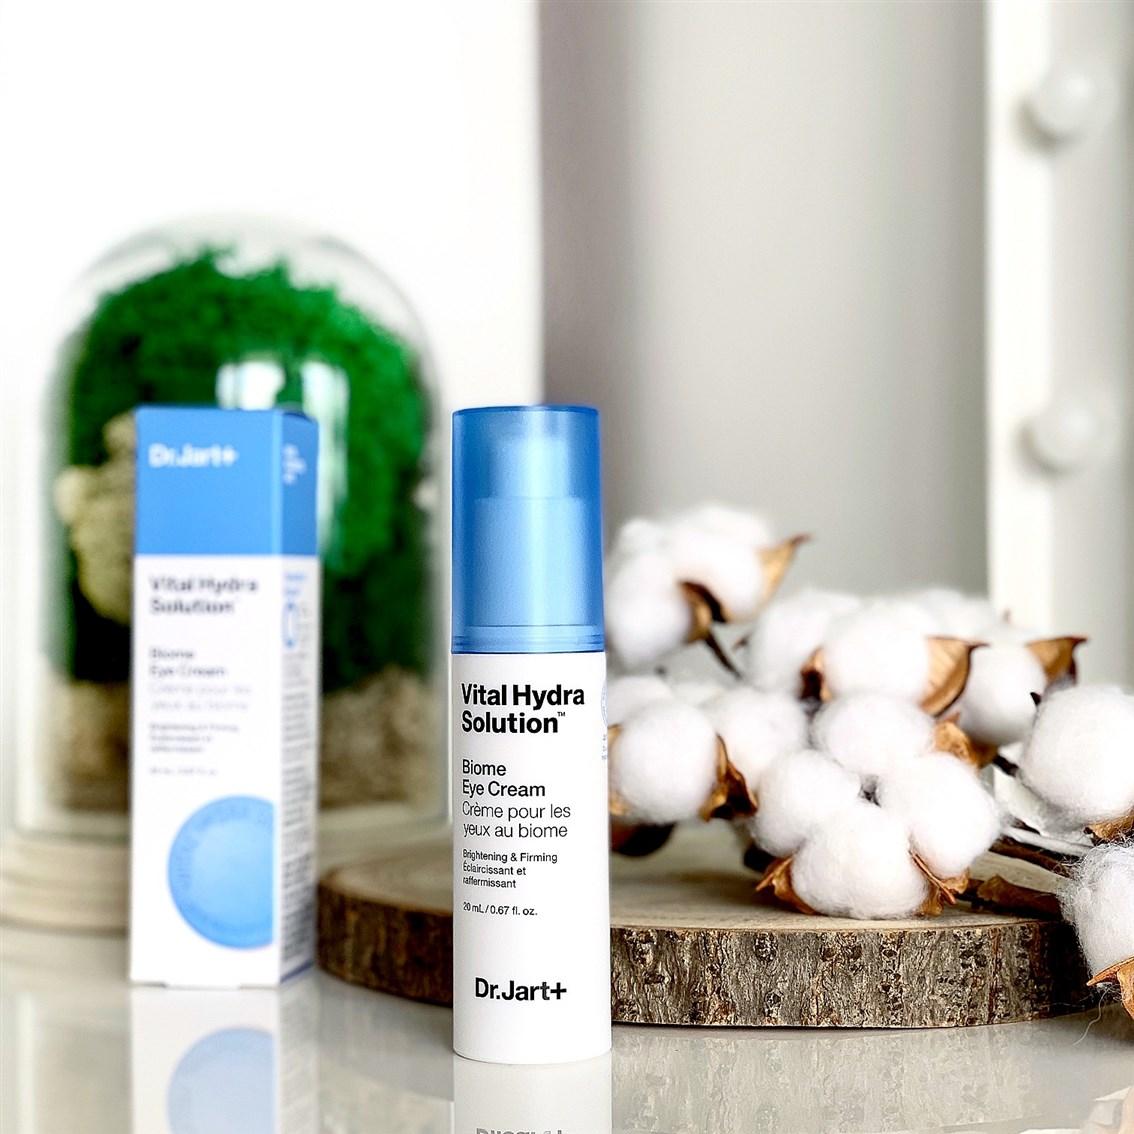 Dr. Jart+ Vital Hydra Solution Biome Eye Cream opinie